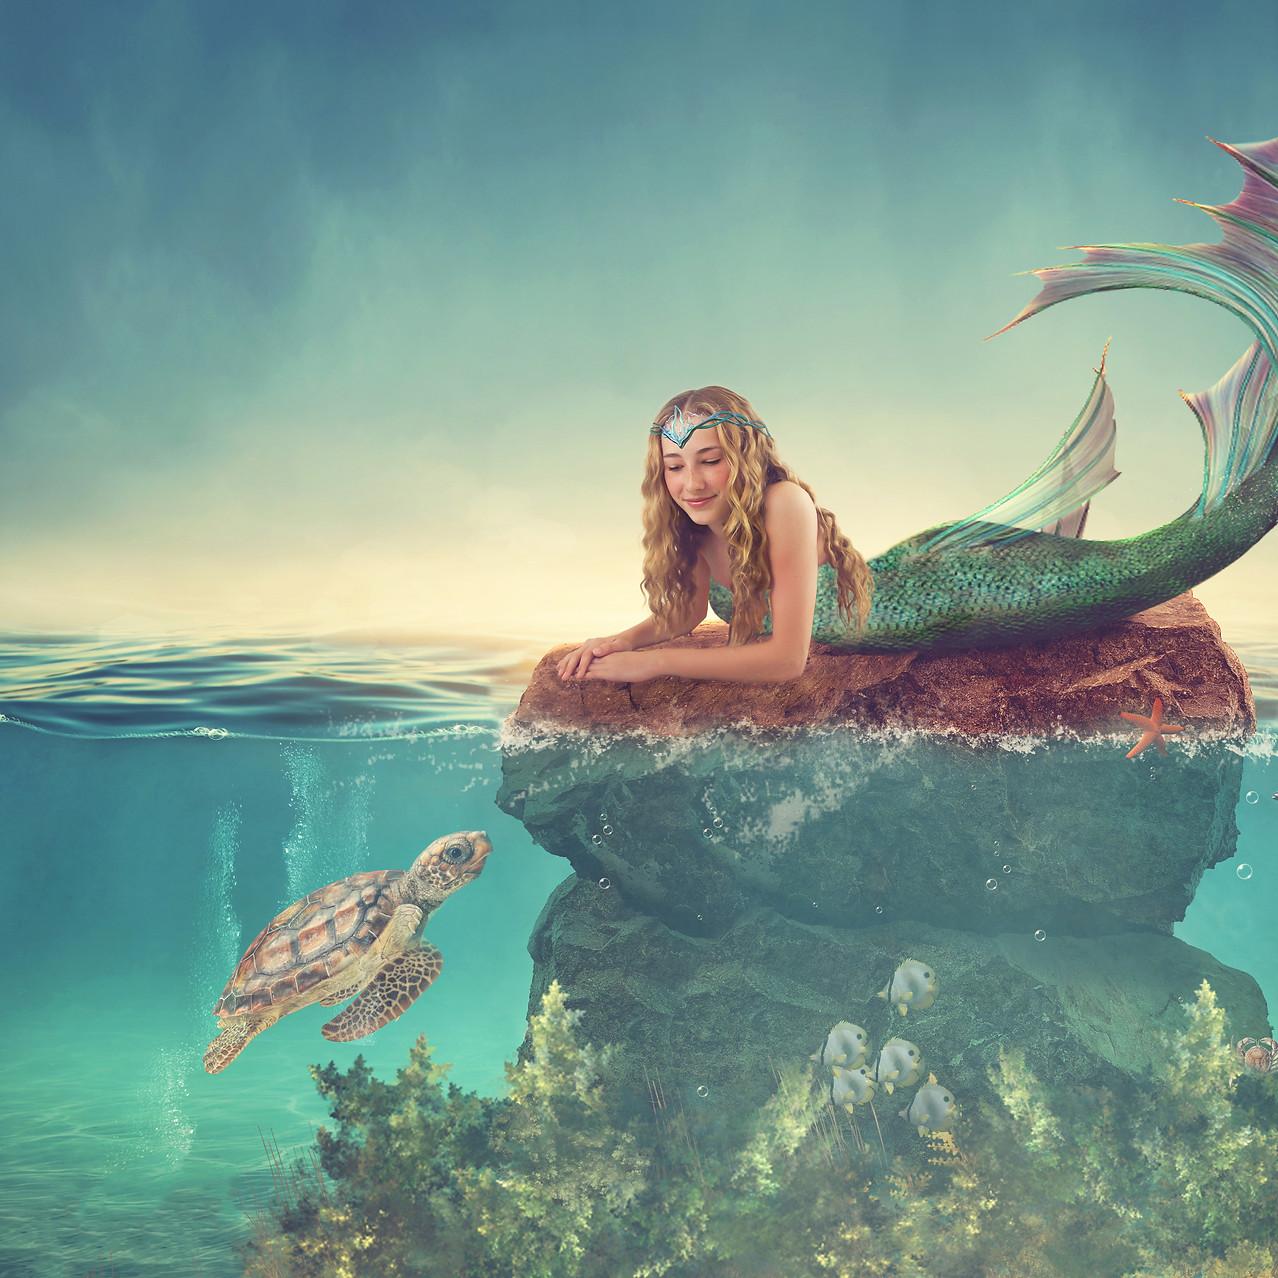 Tiara.Creative Children's Photography fantasy photoshoot, Dream Alice Photography & Art, Gold Coast